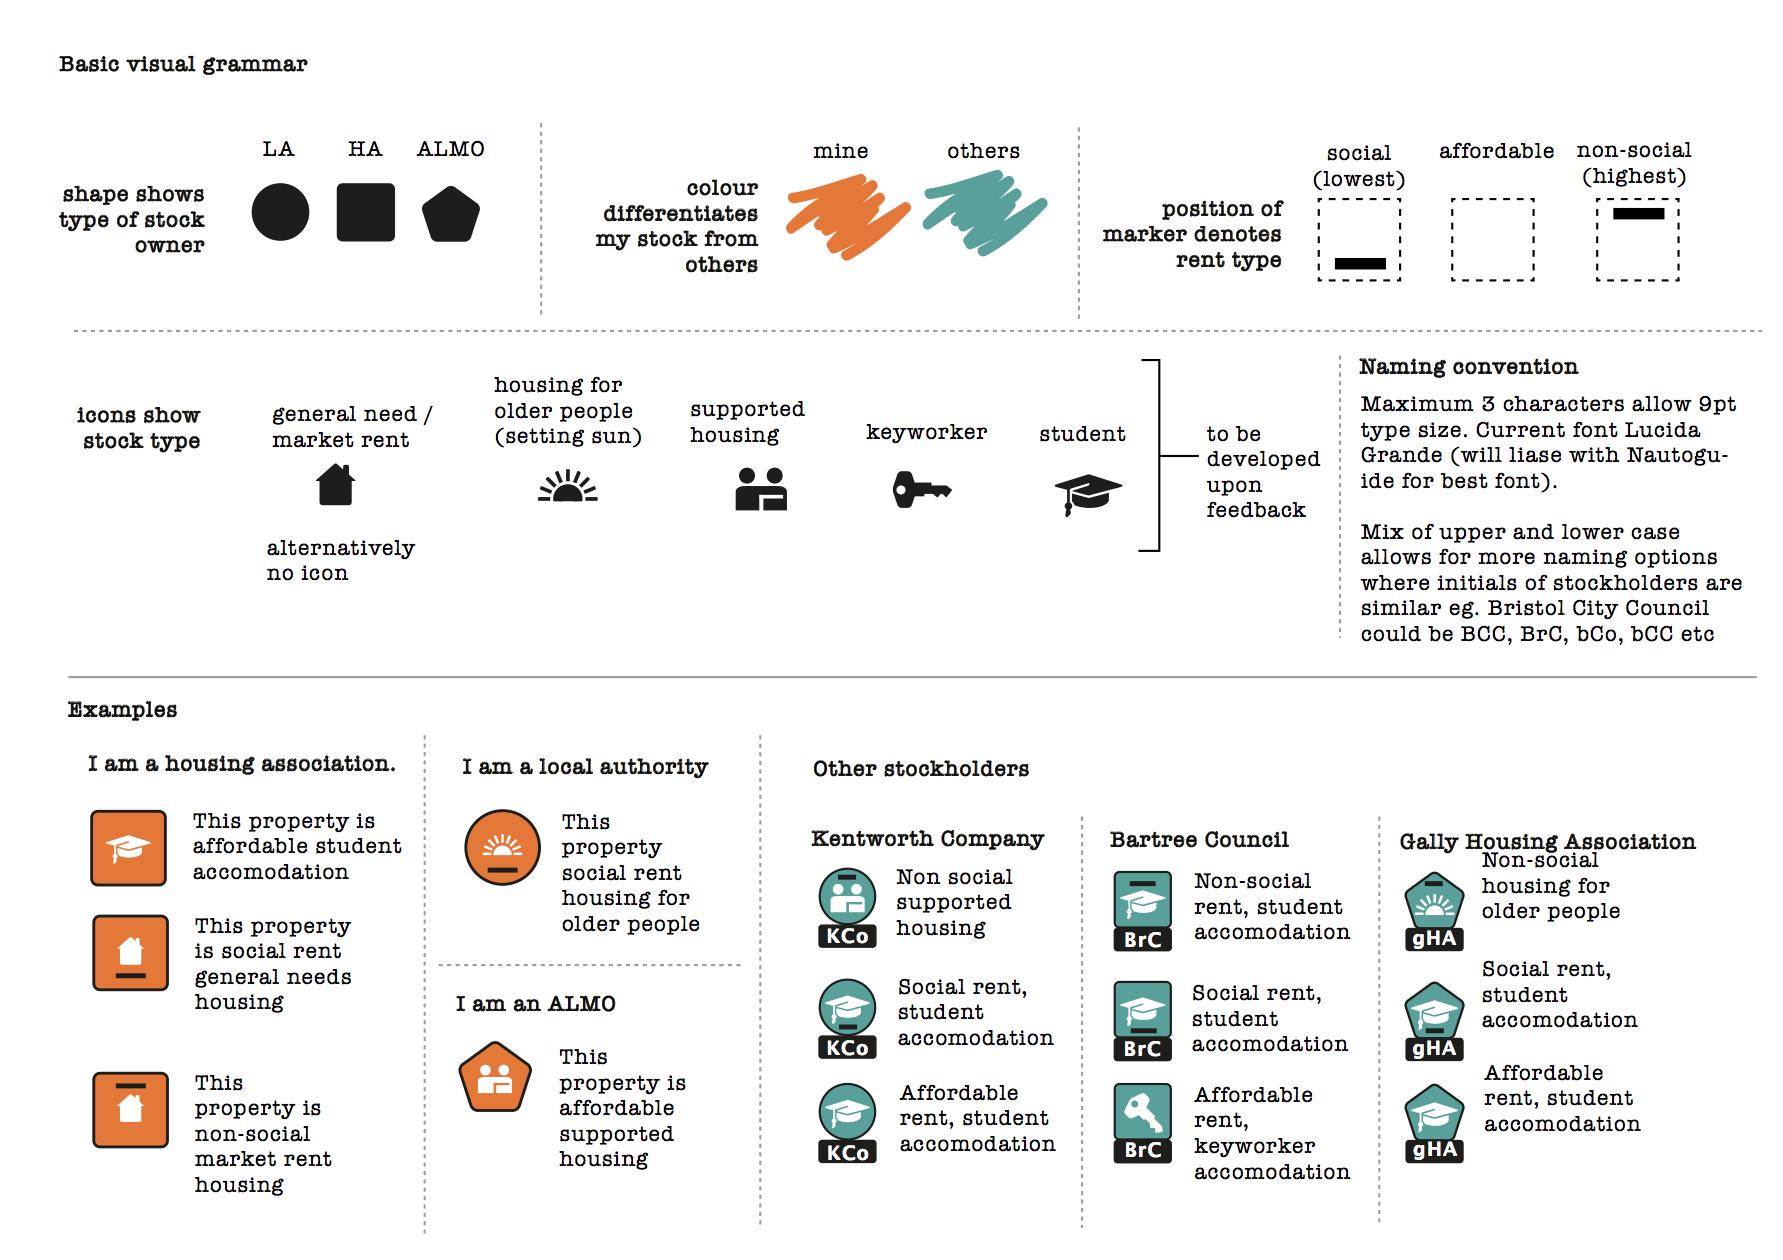 housemark, nautoguide, UI, UX, social housing